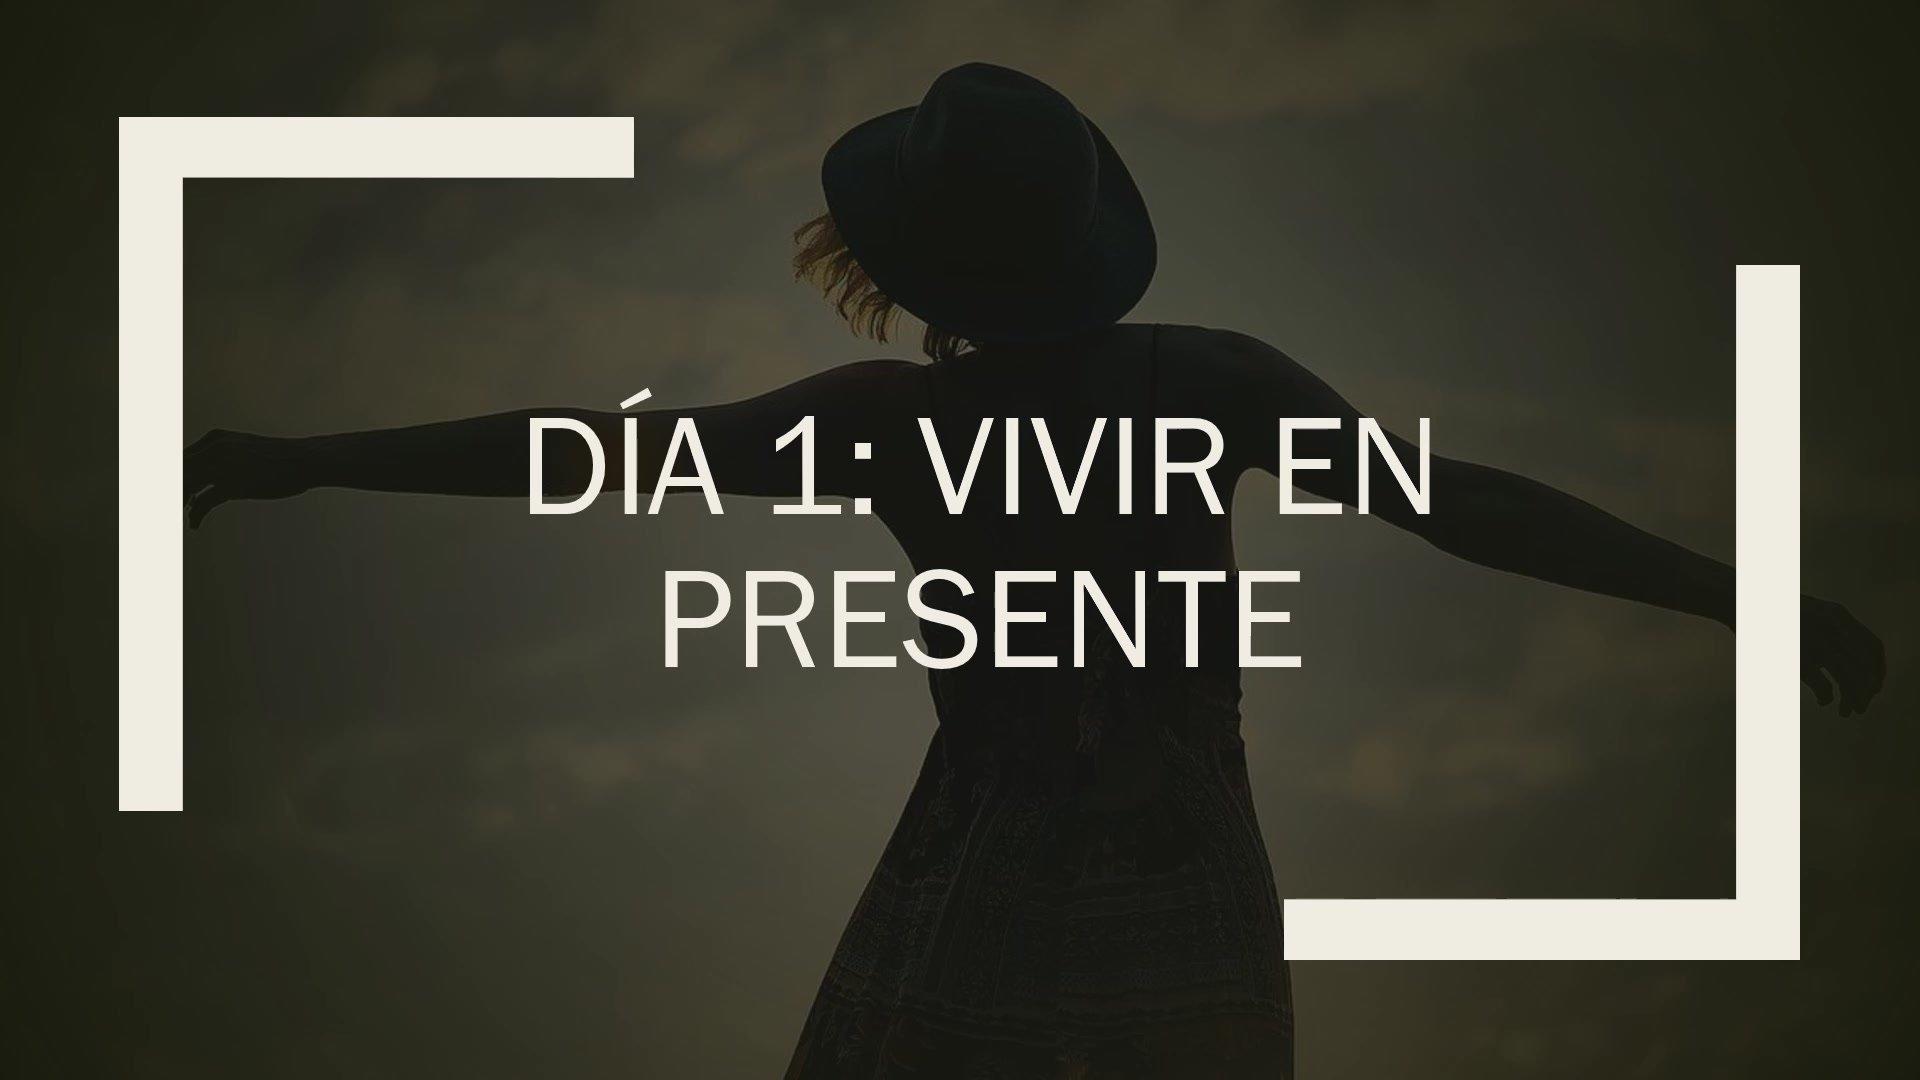 DIA 1 - VIVIR EN PRESENTE